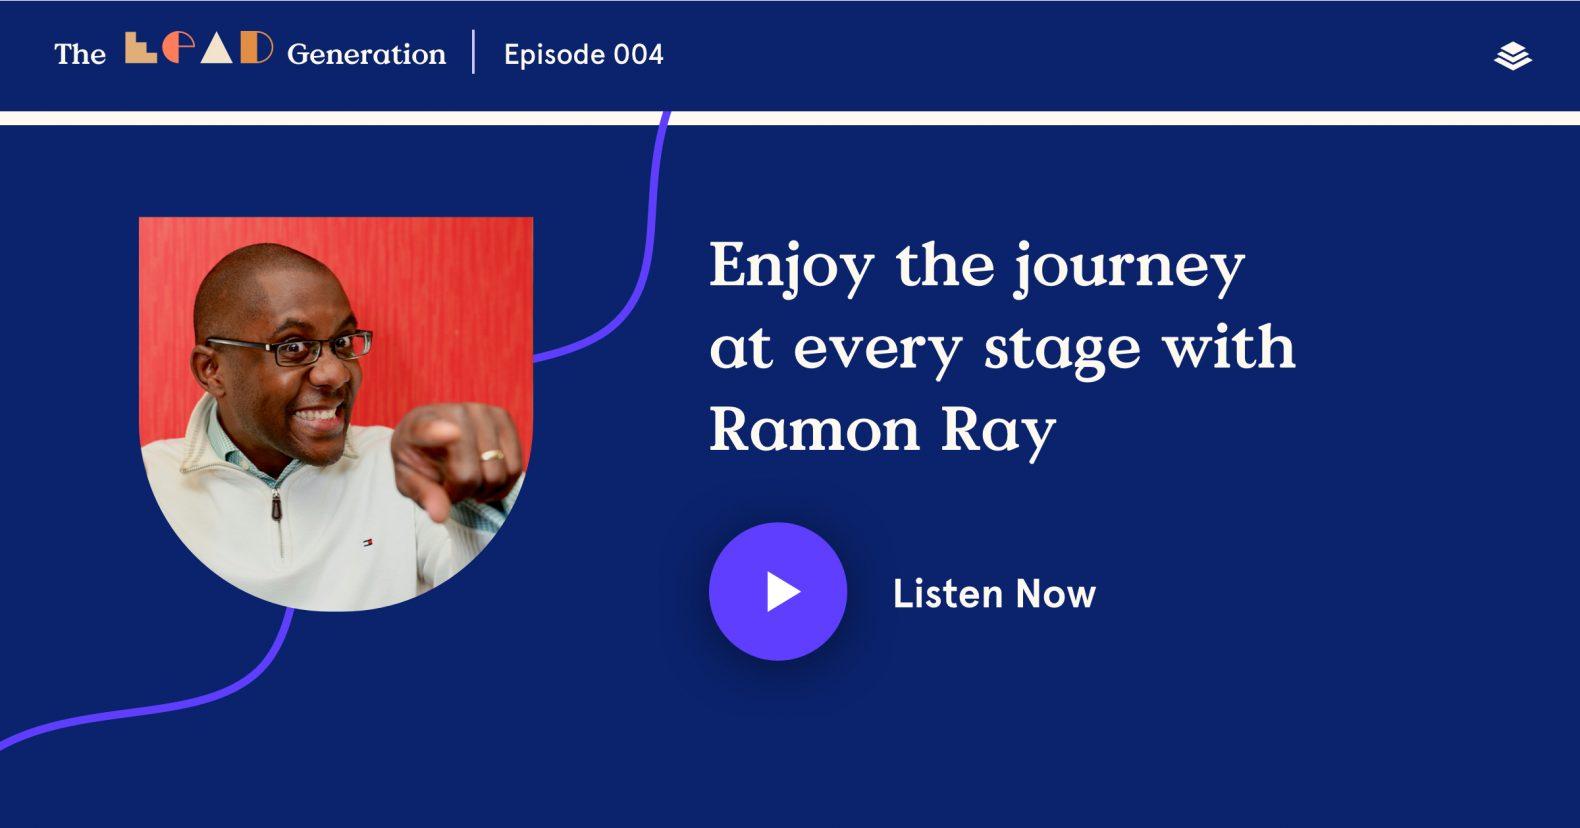 Ramon Ray on The Lead Generation